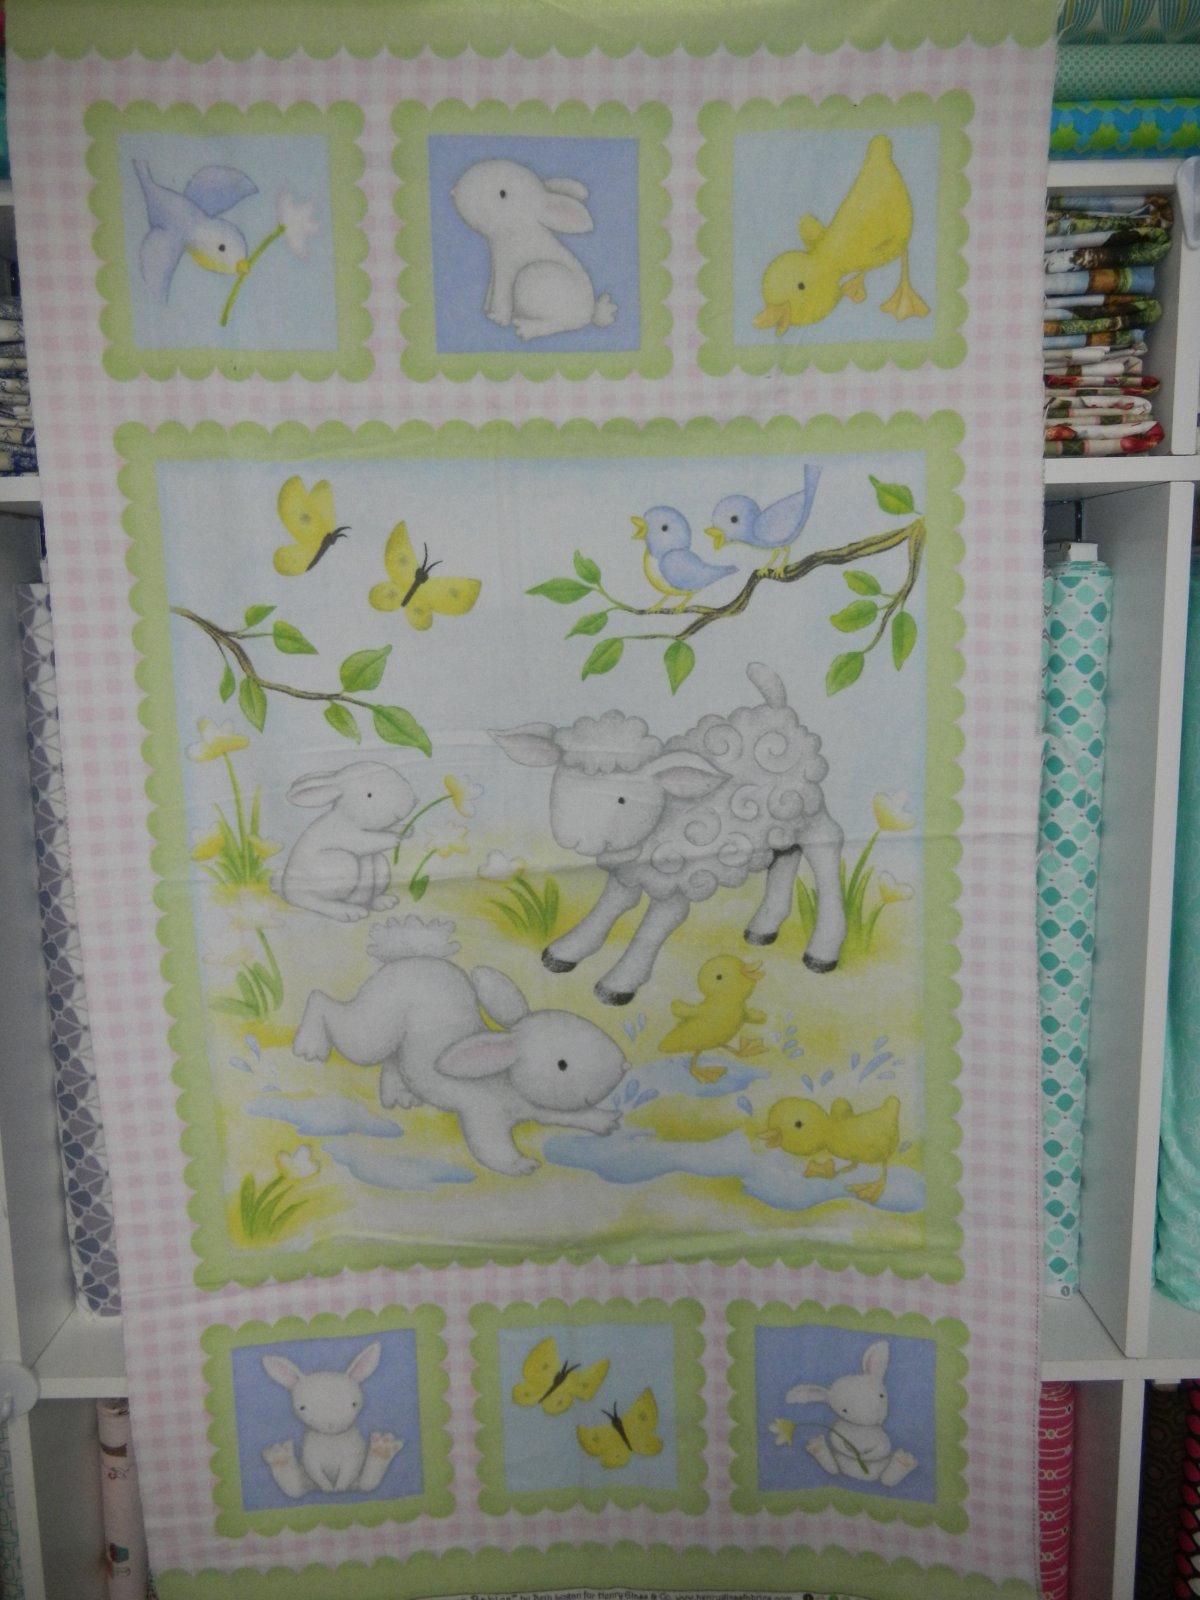 Panel#5 - Flannel - Lamb/Bunny - Blue/green